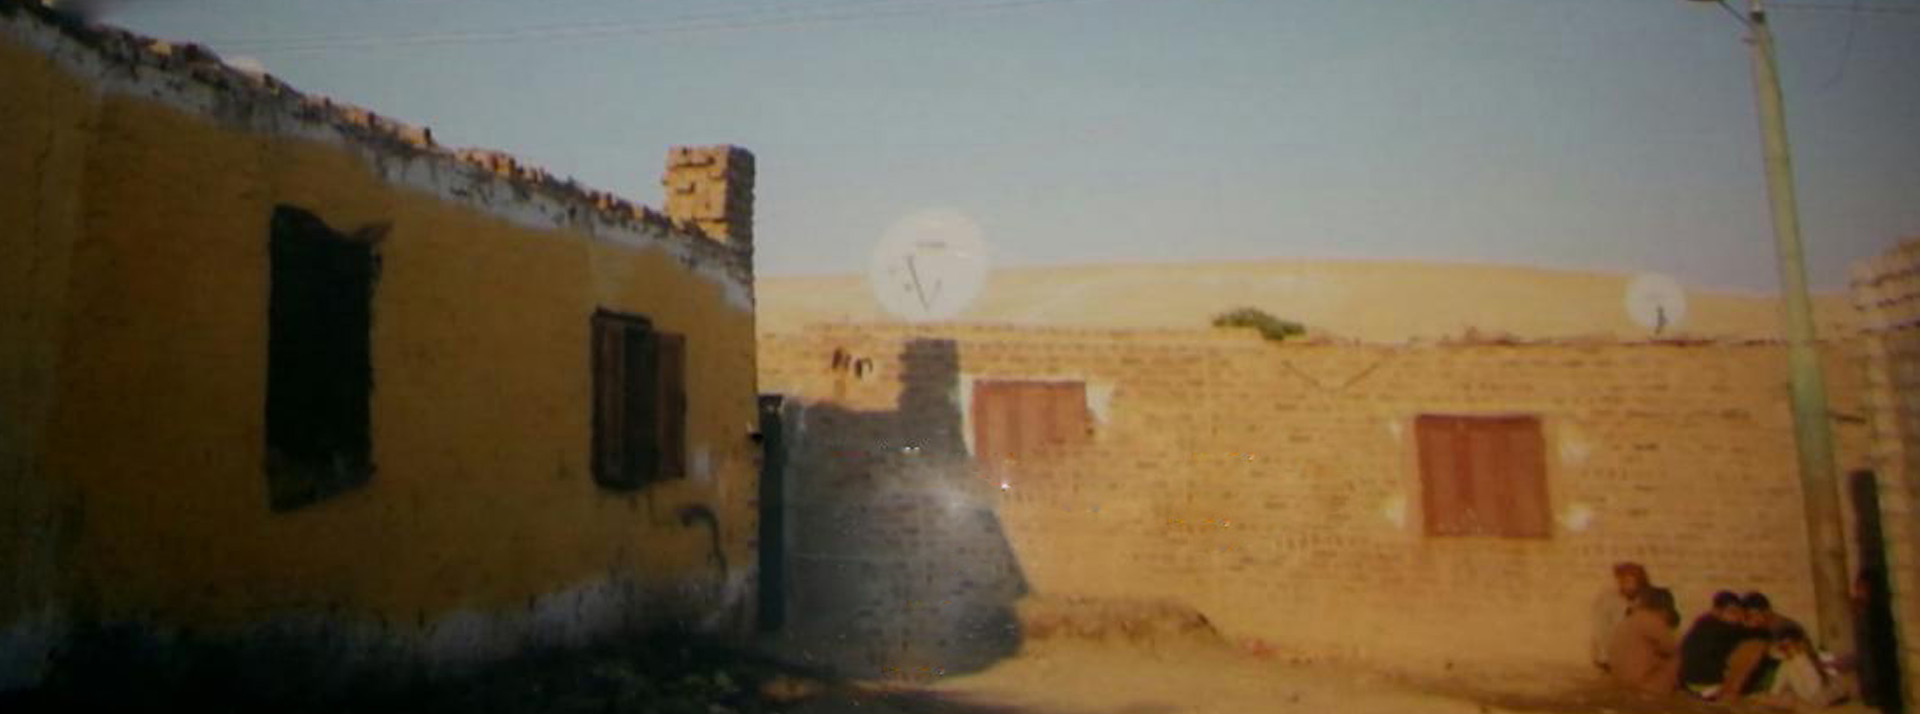 El Ghareera Village Development